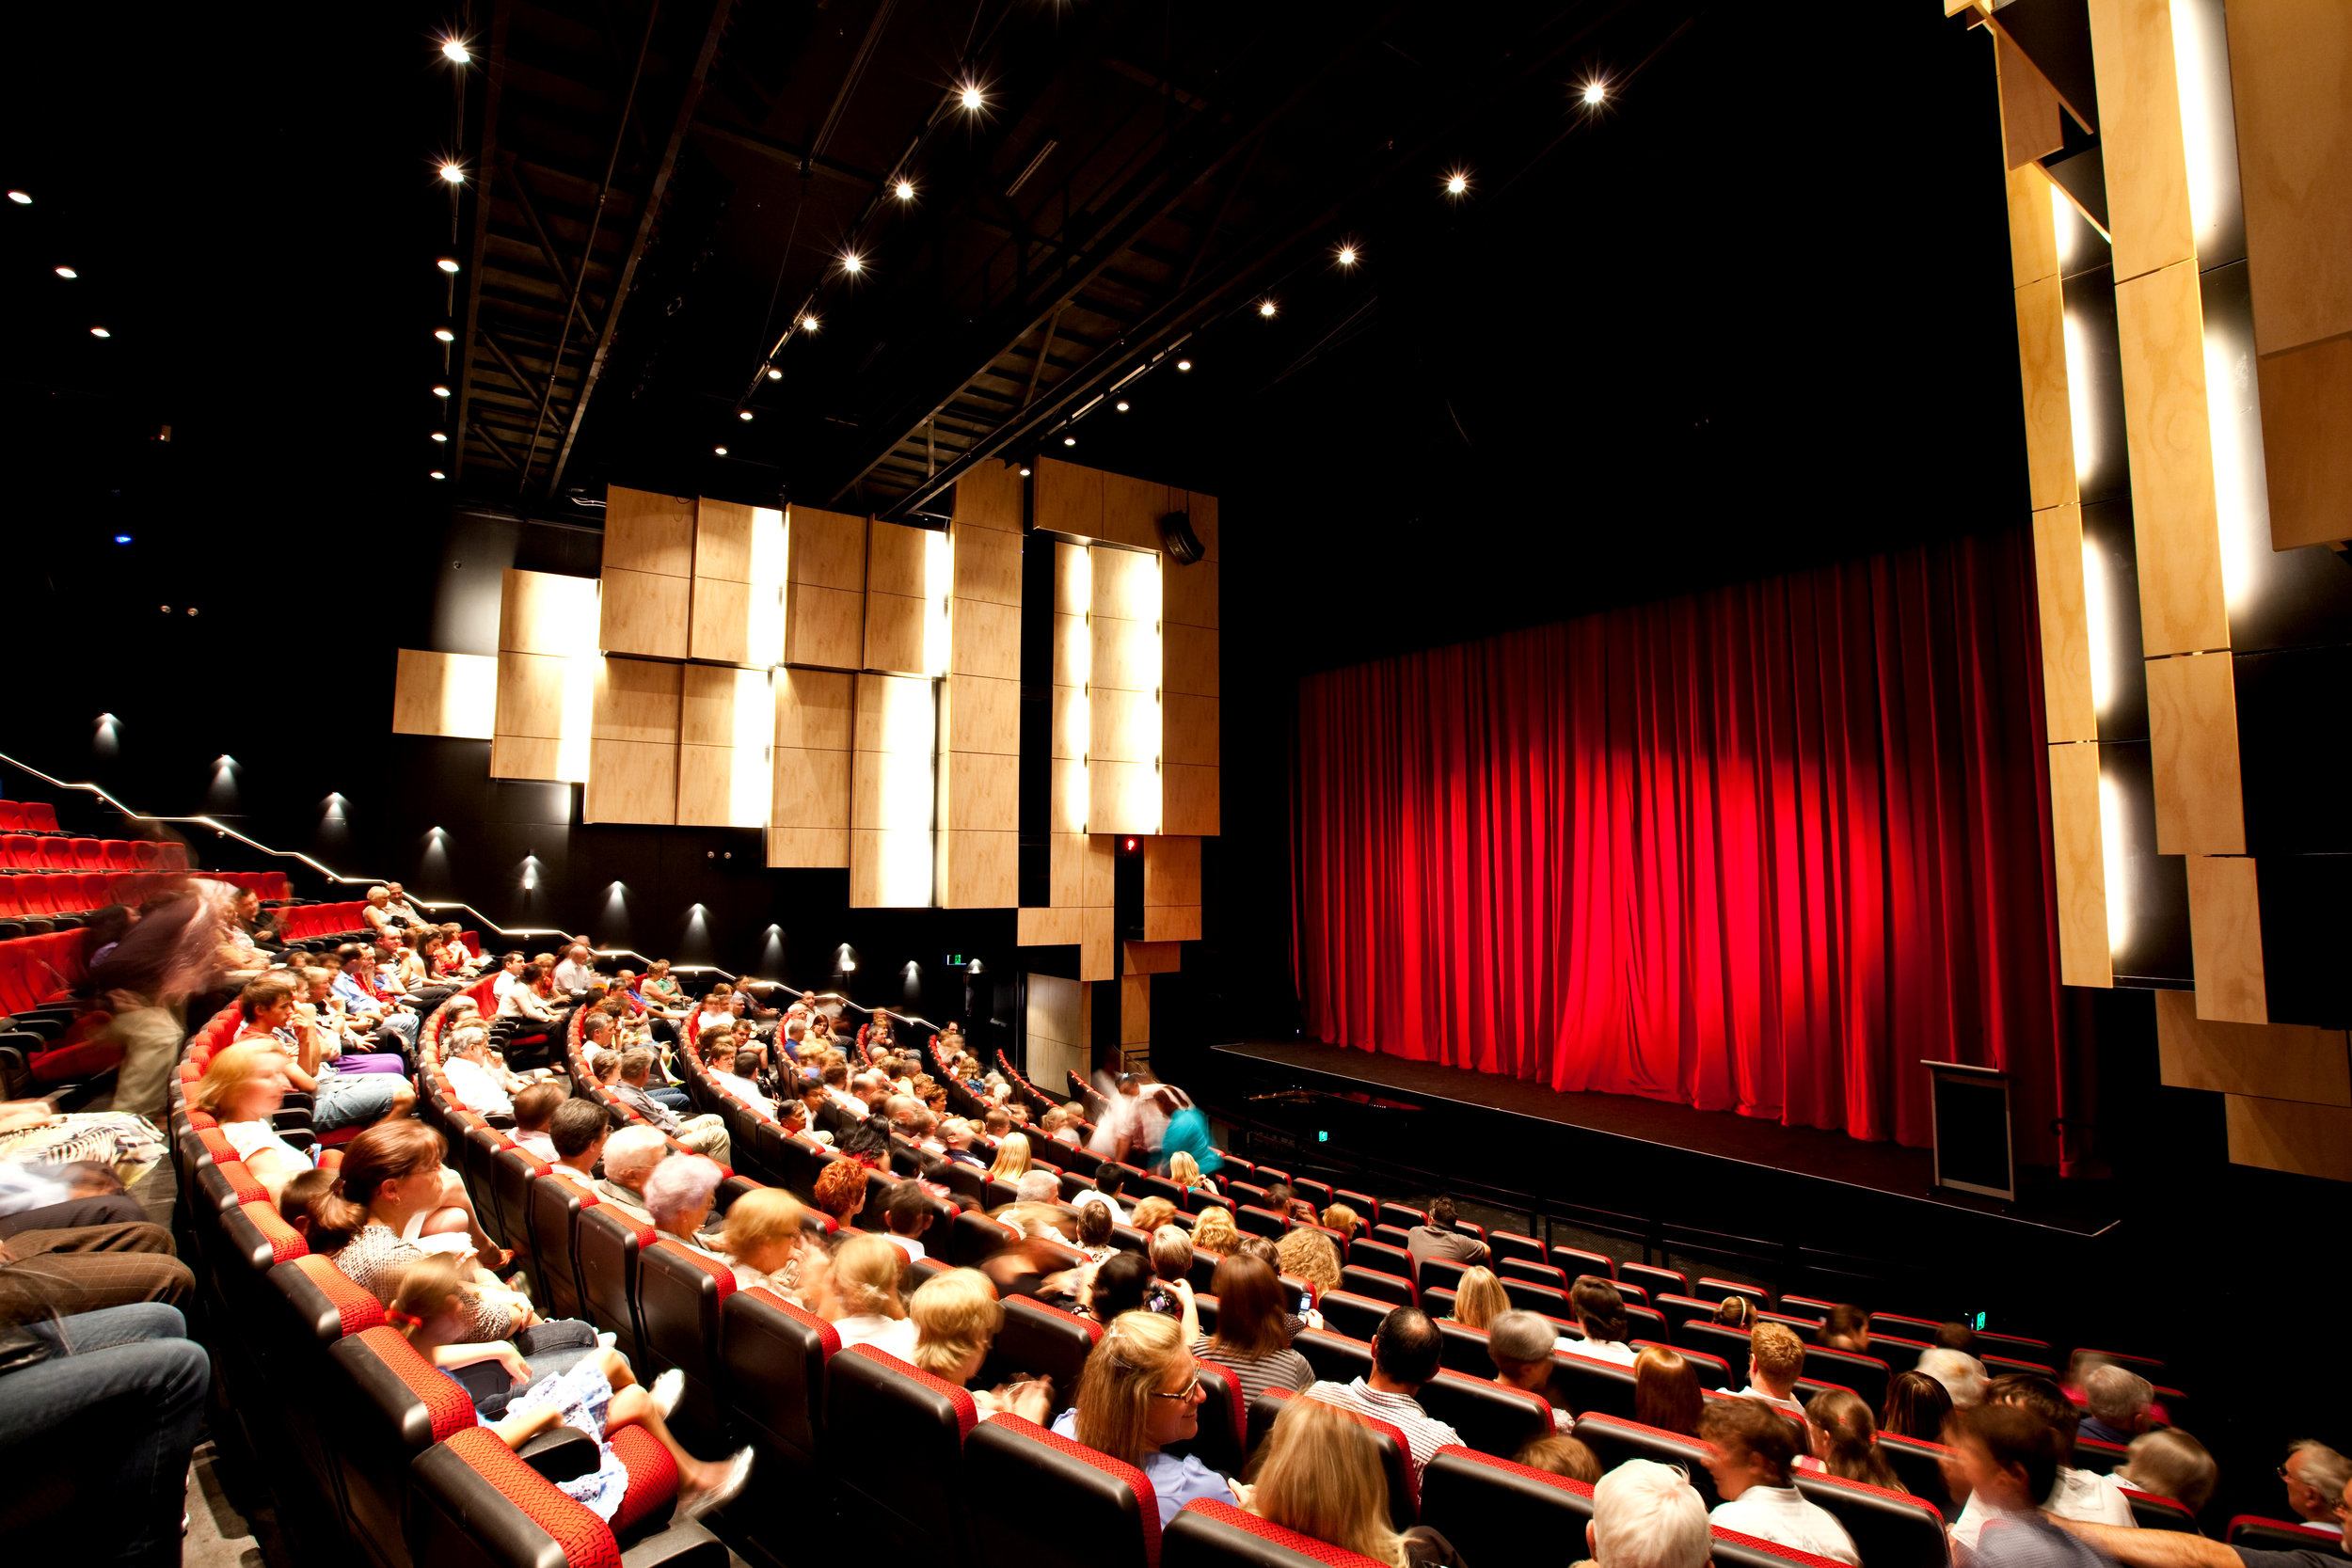 Dubbo_Regional_Theatre_tiered_seating (1).jpg